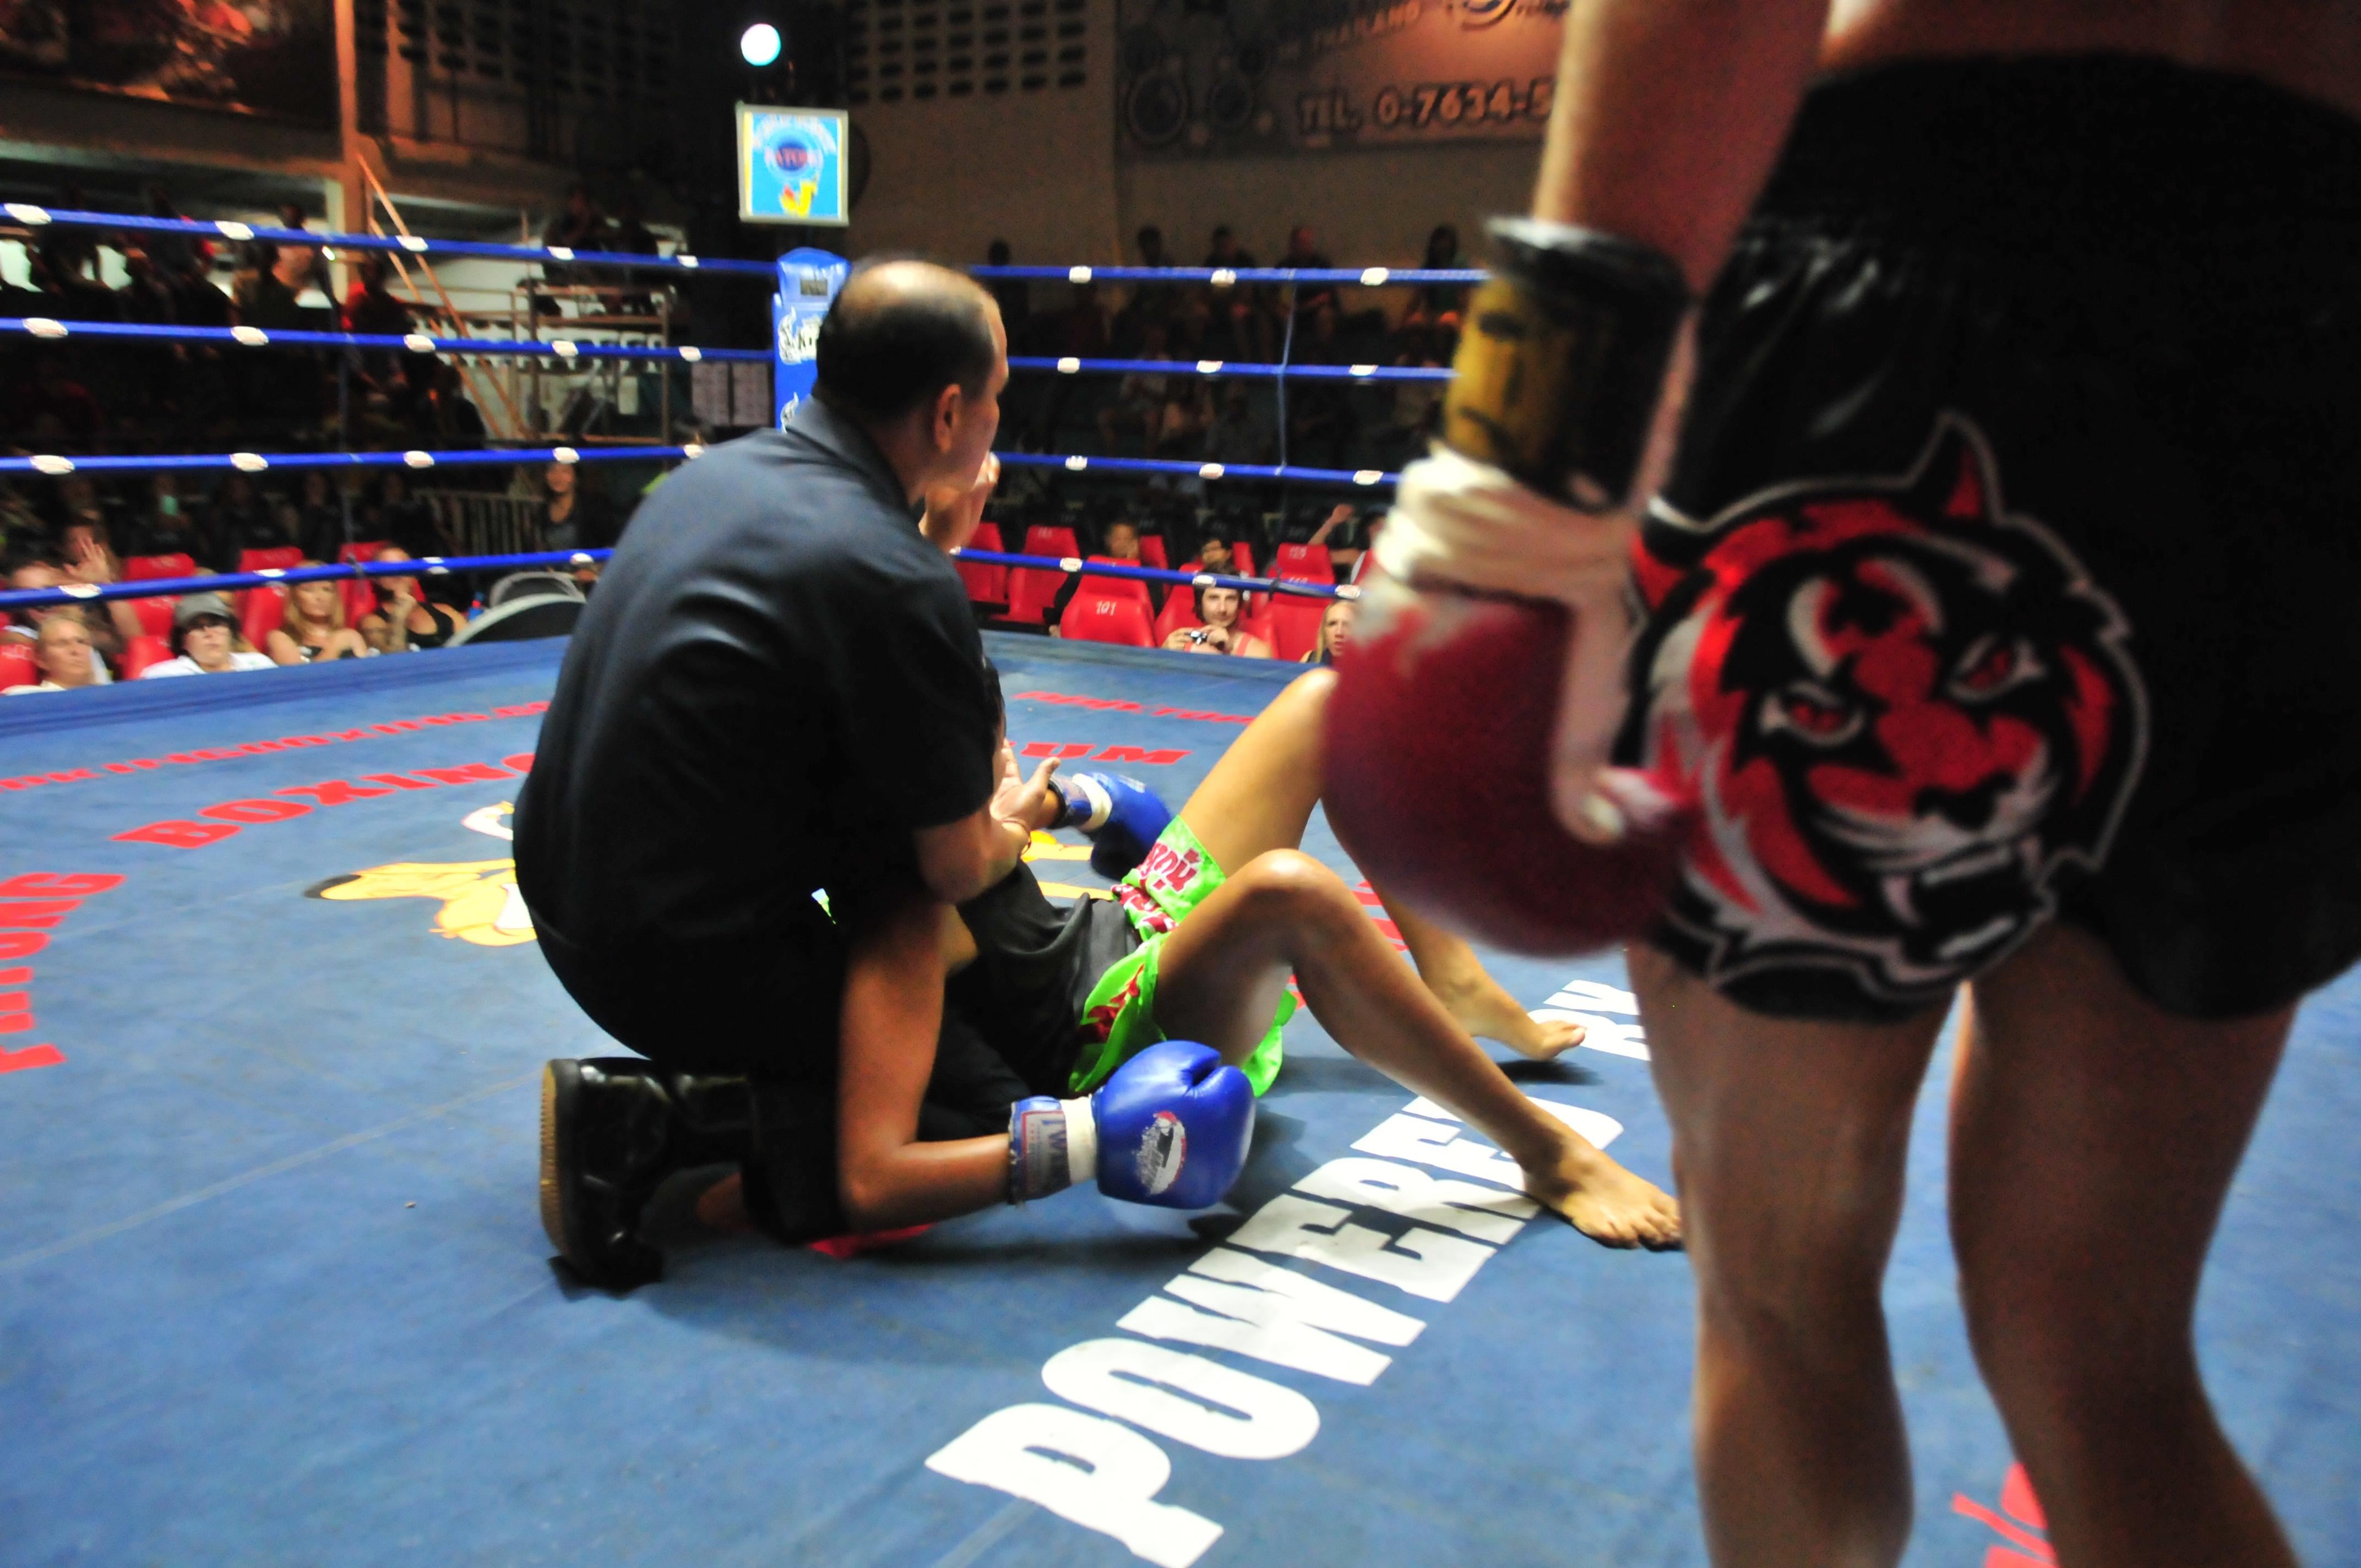 KO Win for #1 Ranked MMA Fighter Cat Zingano in Muay Thai